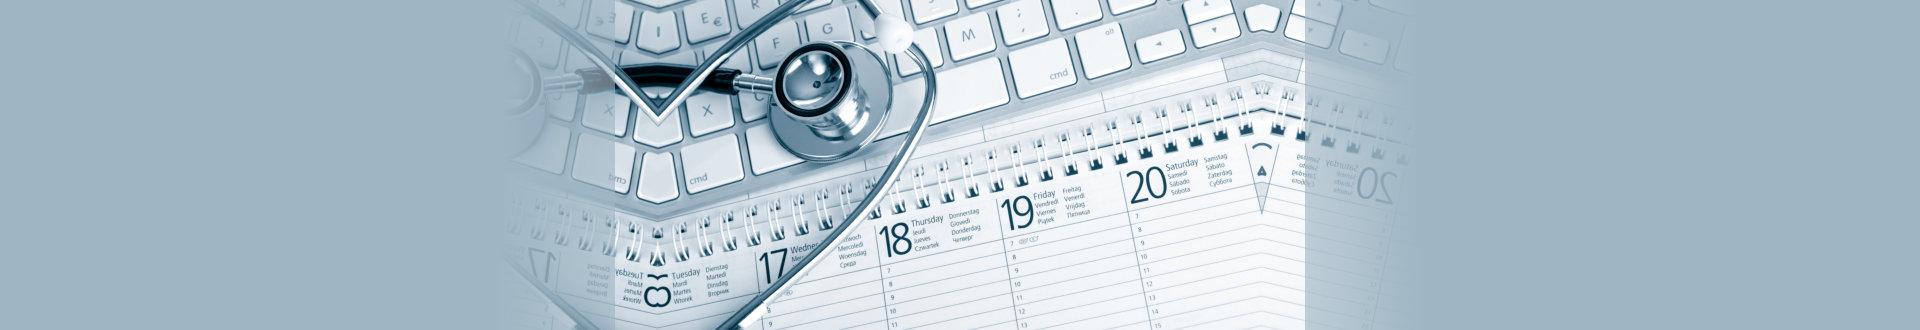 stethoscope and calendar